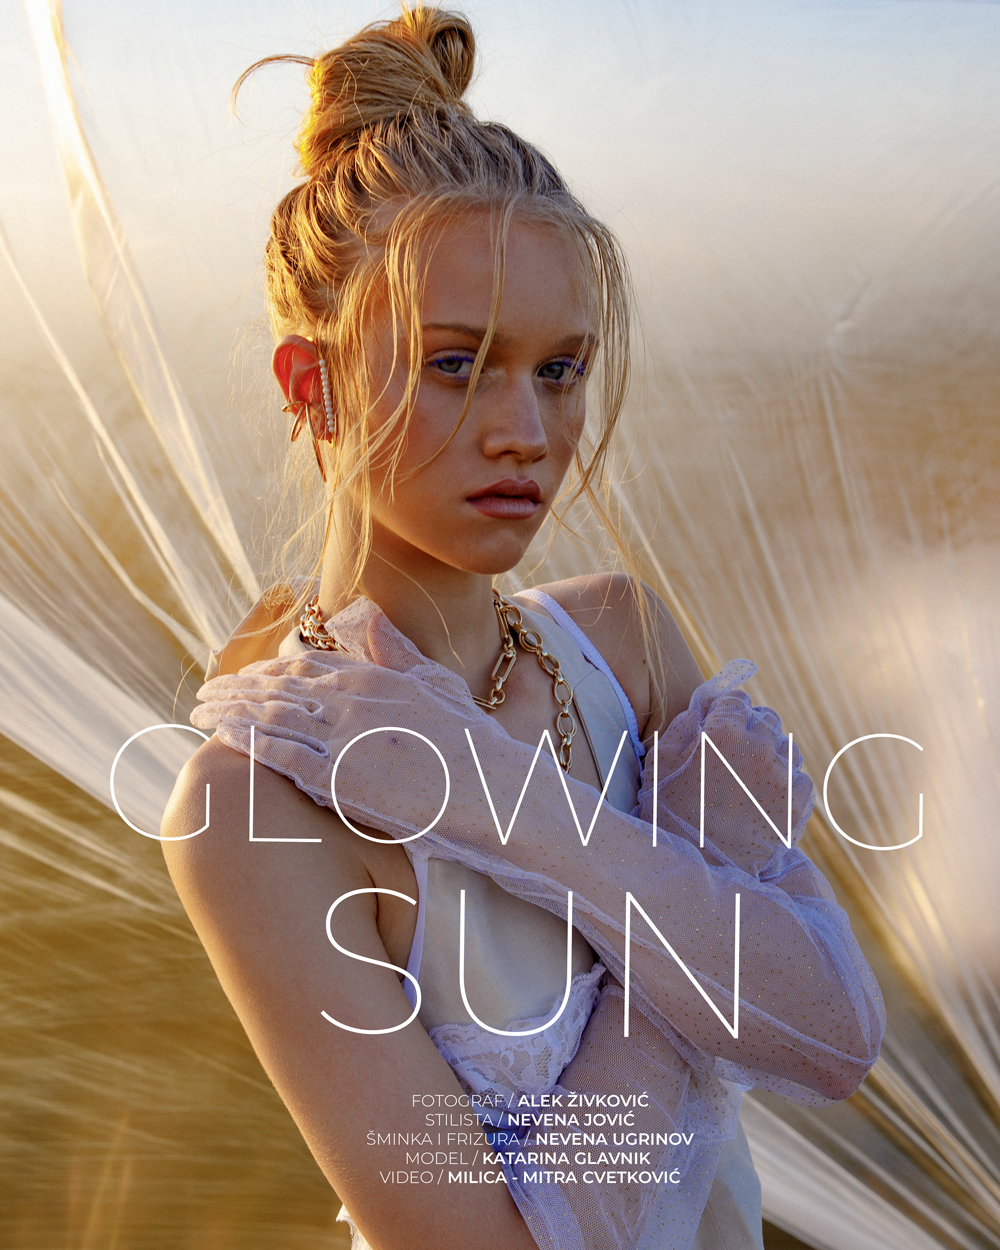 WANNABE EDITORIJAL: Glowing Sun